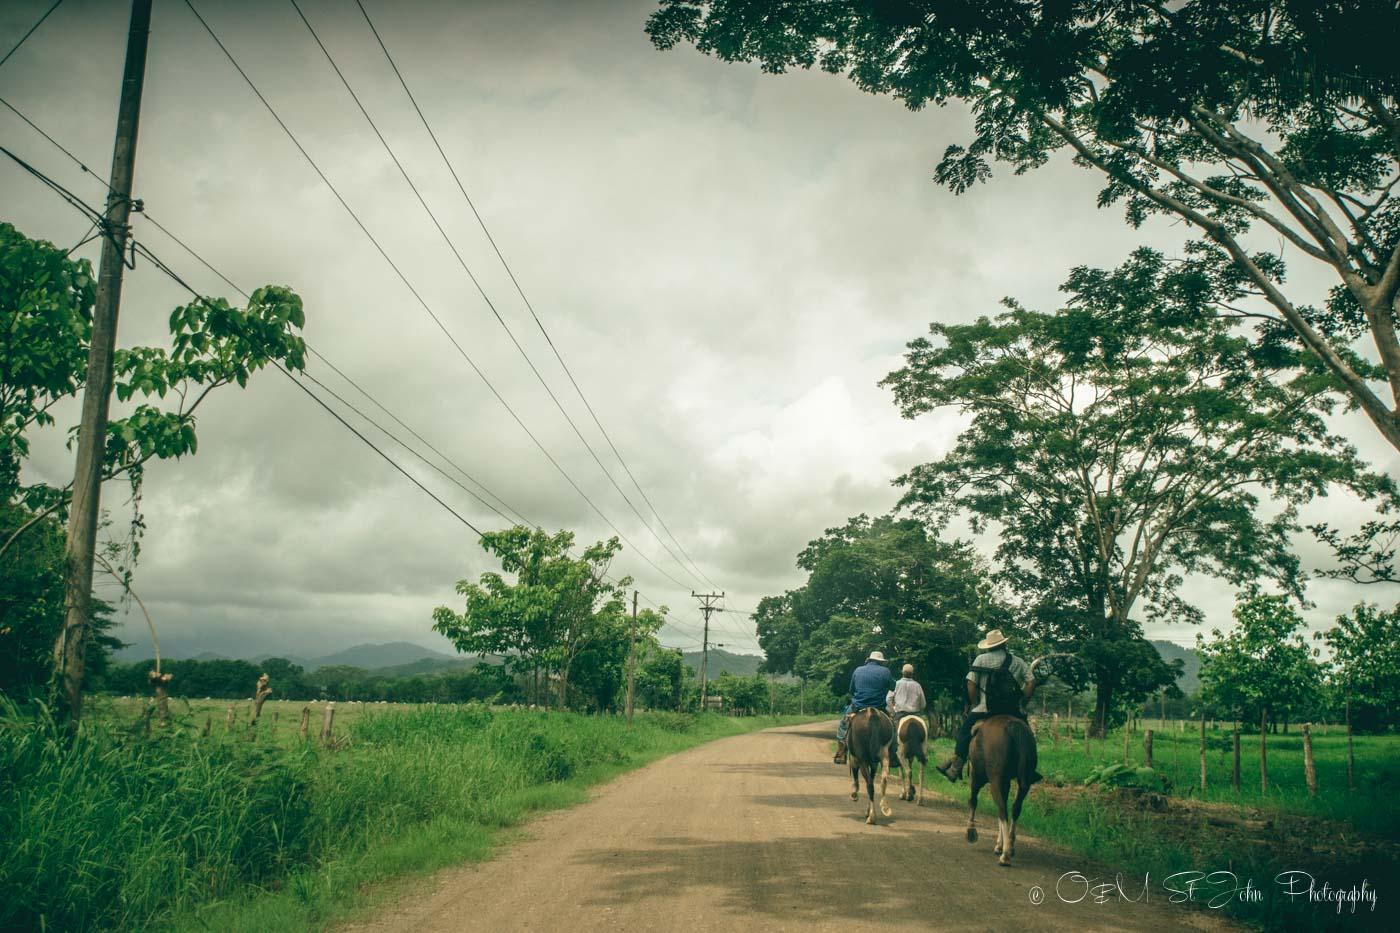 things to do in santa teresa costa rica: Road to Mal Pais, Nicoya Peninsula. Costa Rica